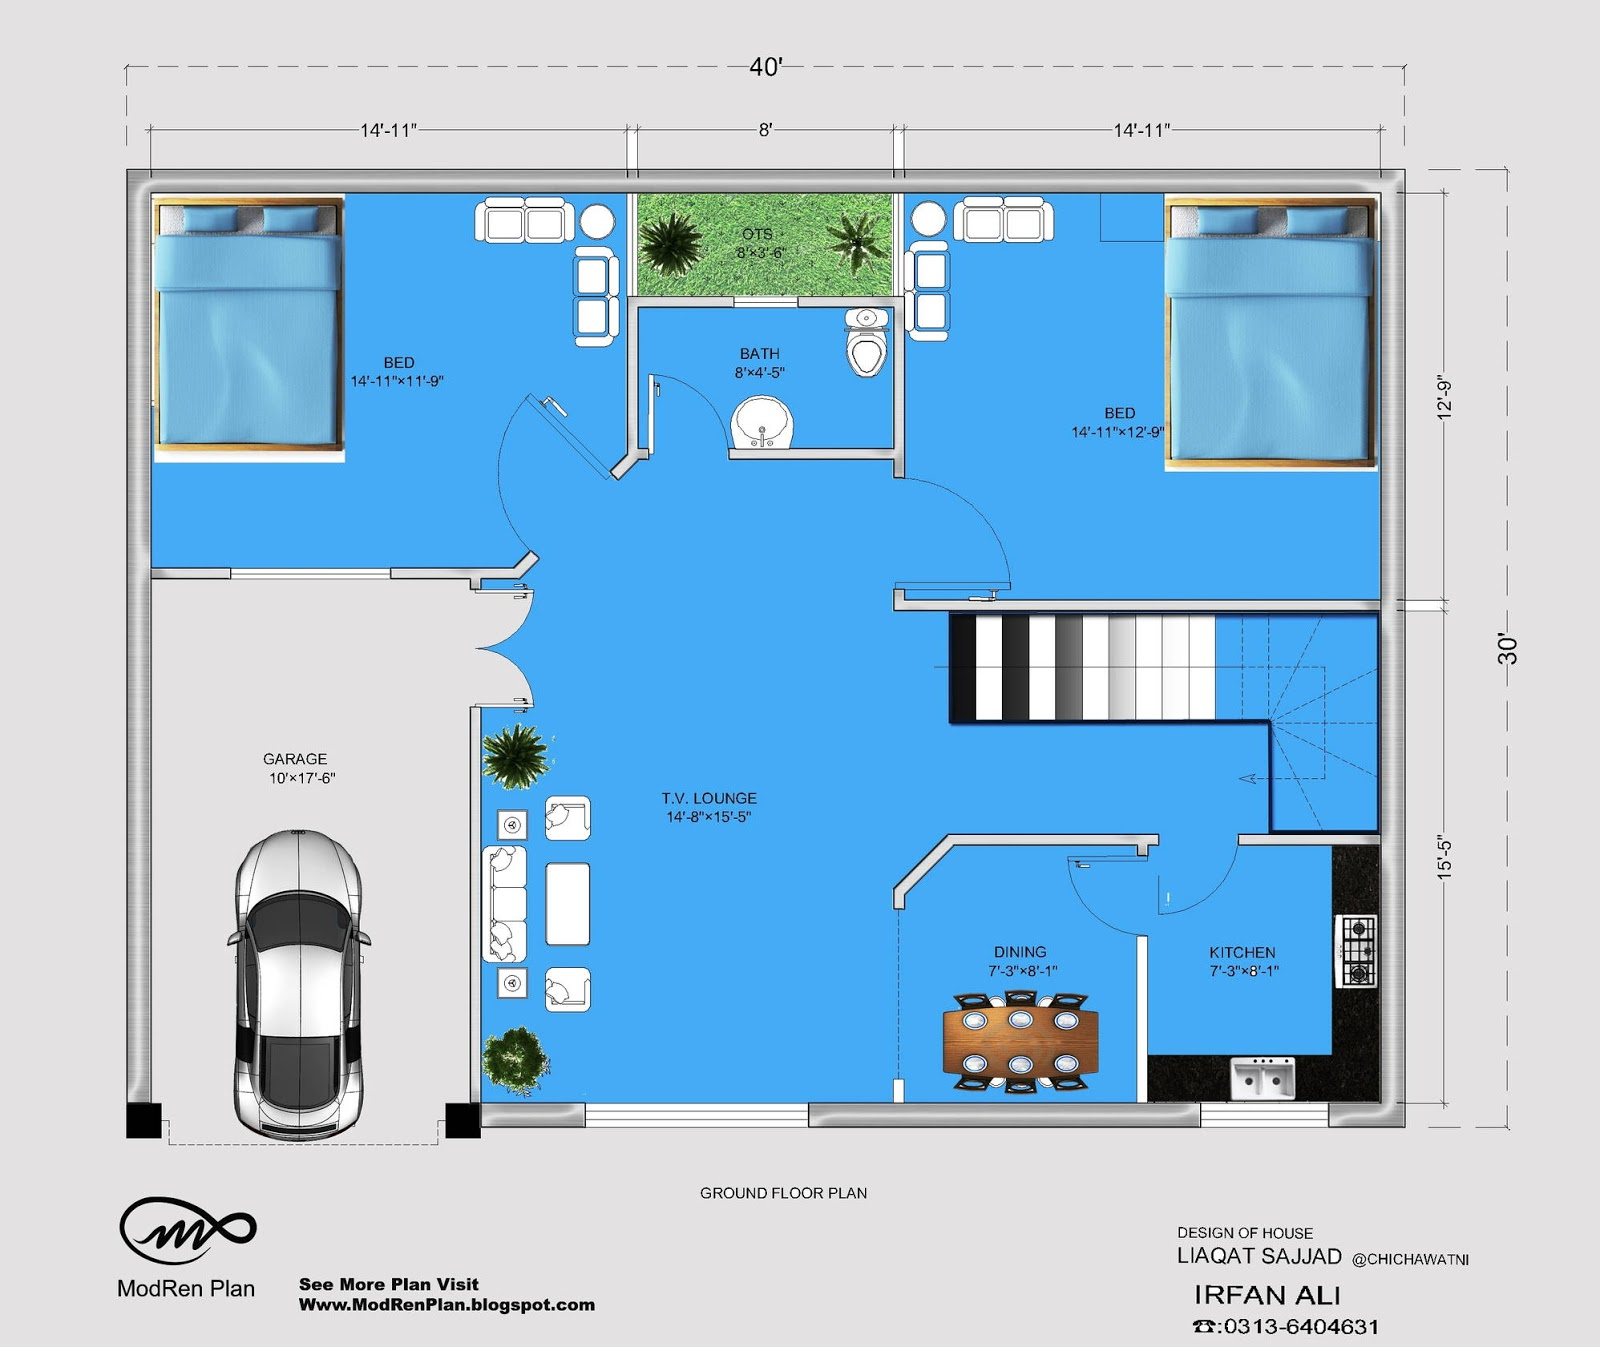 1000 square foot house plans pakistan 5 marla house plan 30x40 small house plan ideas 1200 square